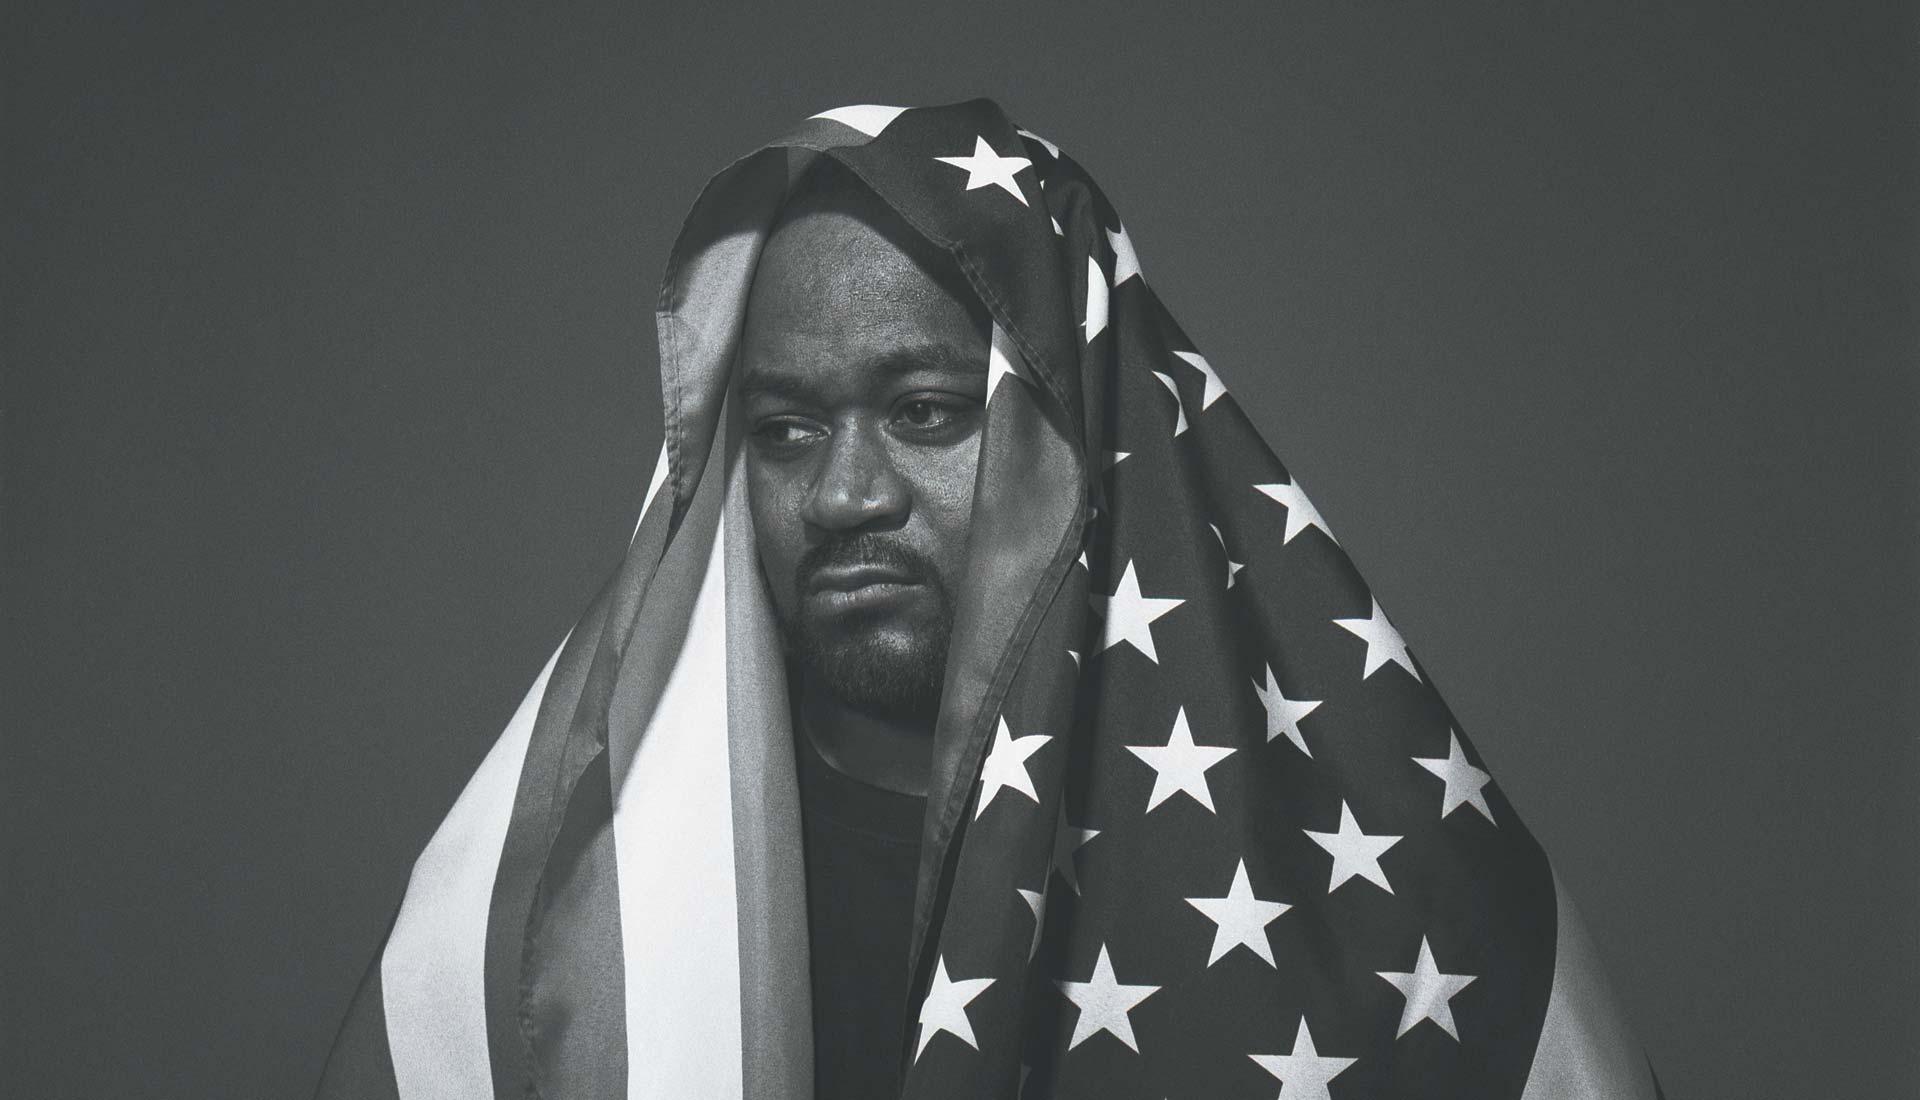 BADBADNOTGOOD & Ghostface Killah v novom videoklipe